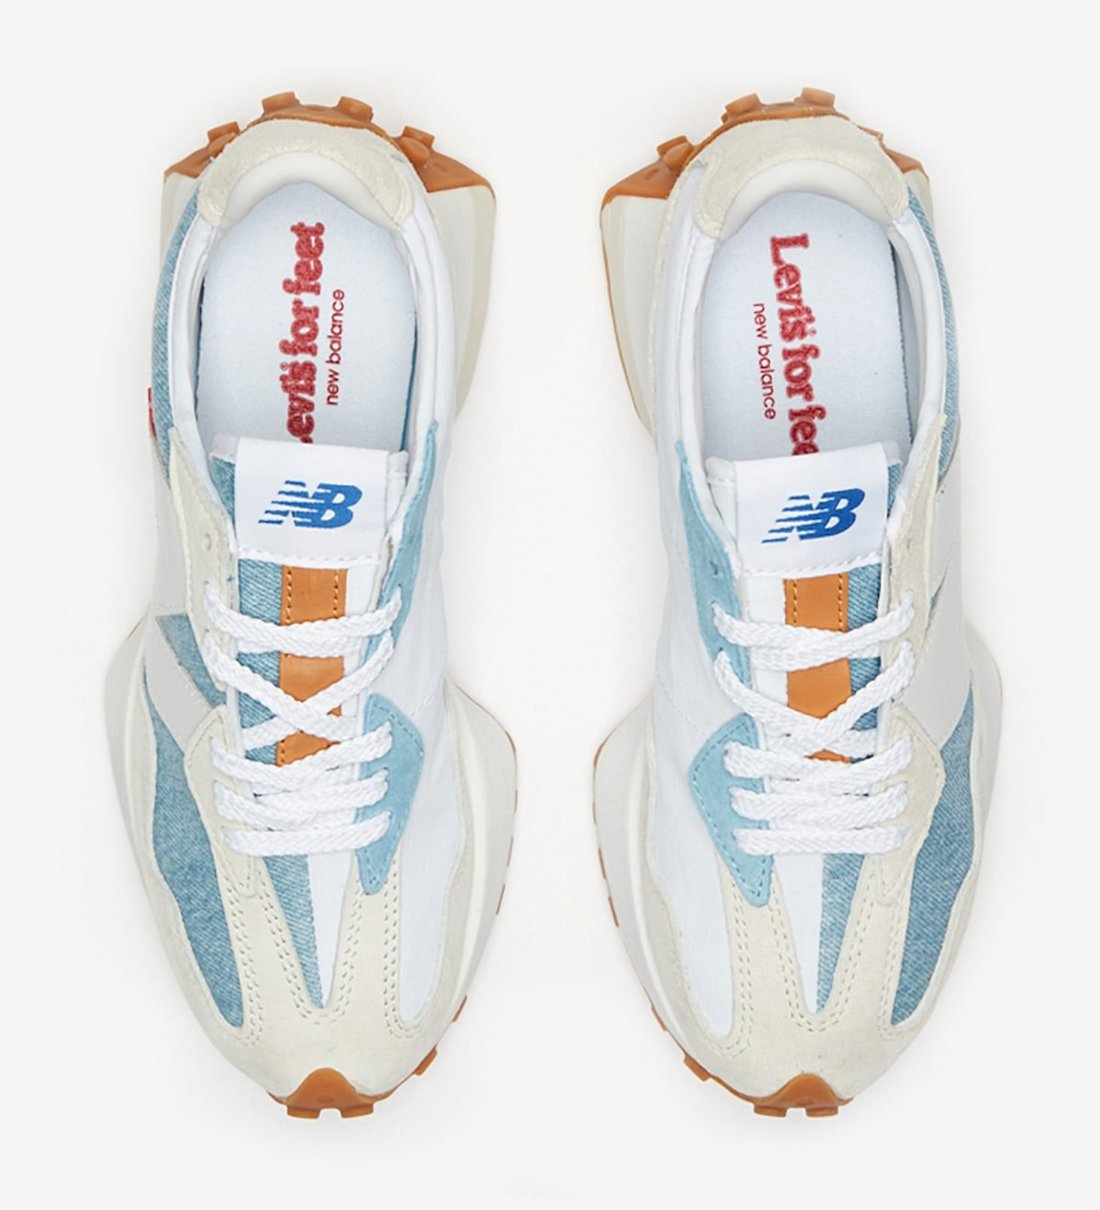 giày thể thao NEW BALANCE 327 x LEVI'S baby blue